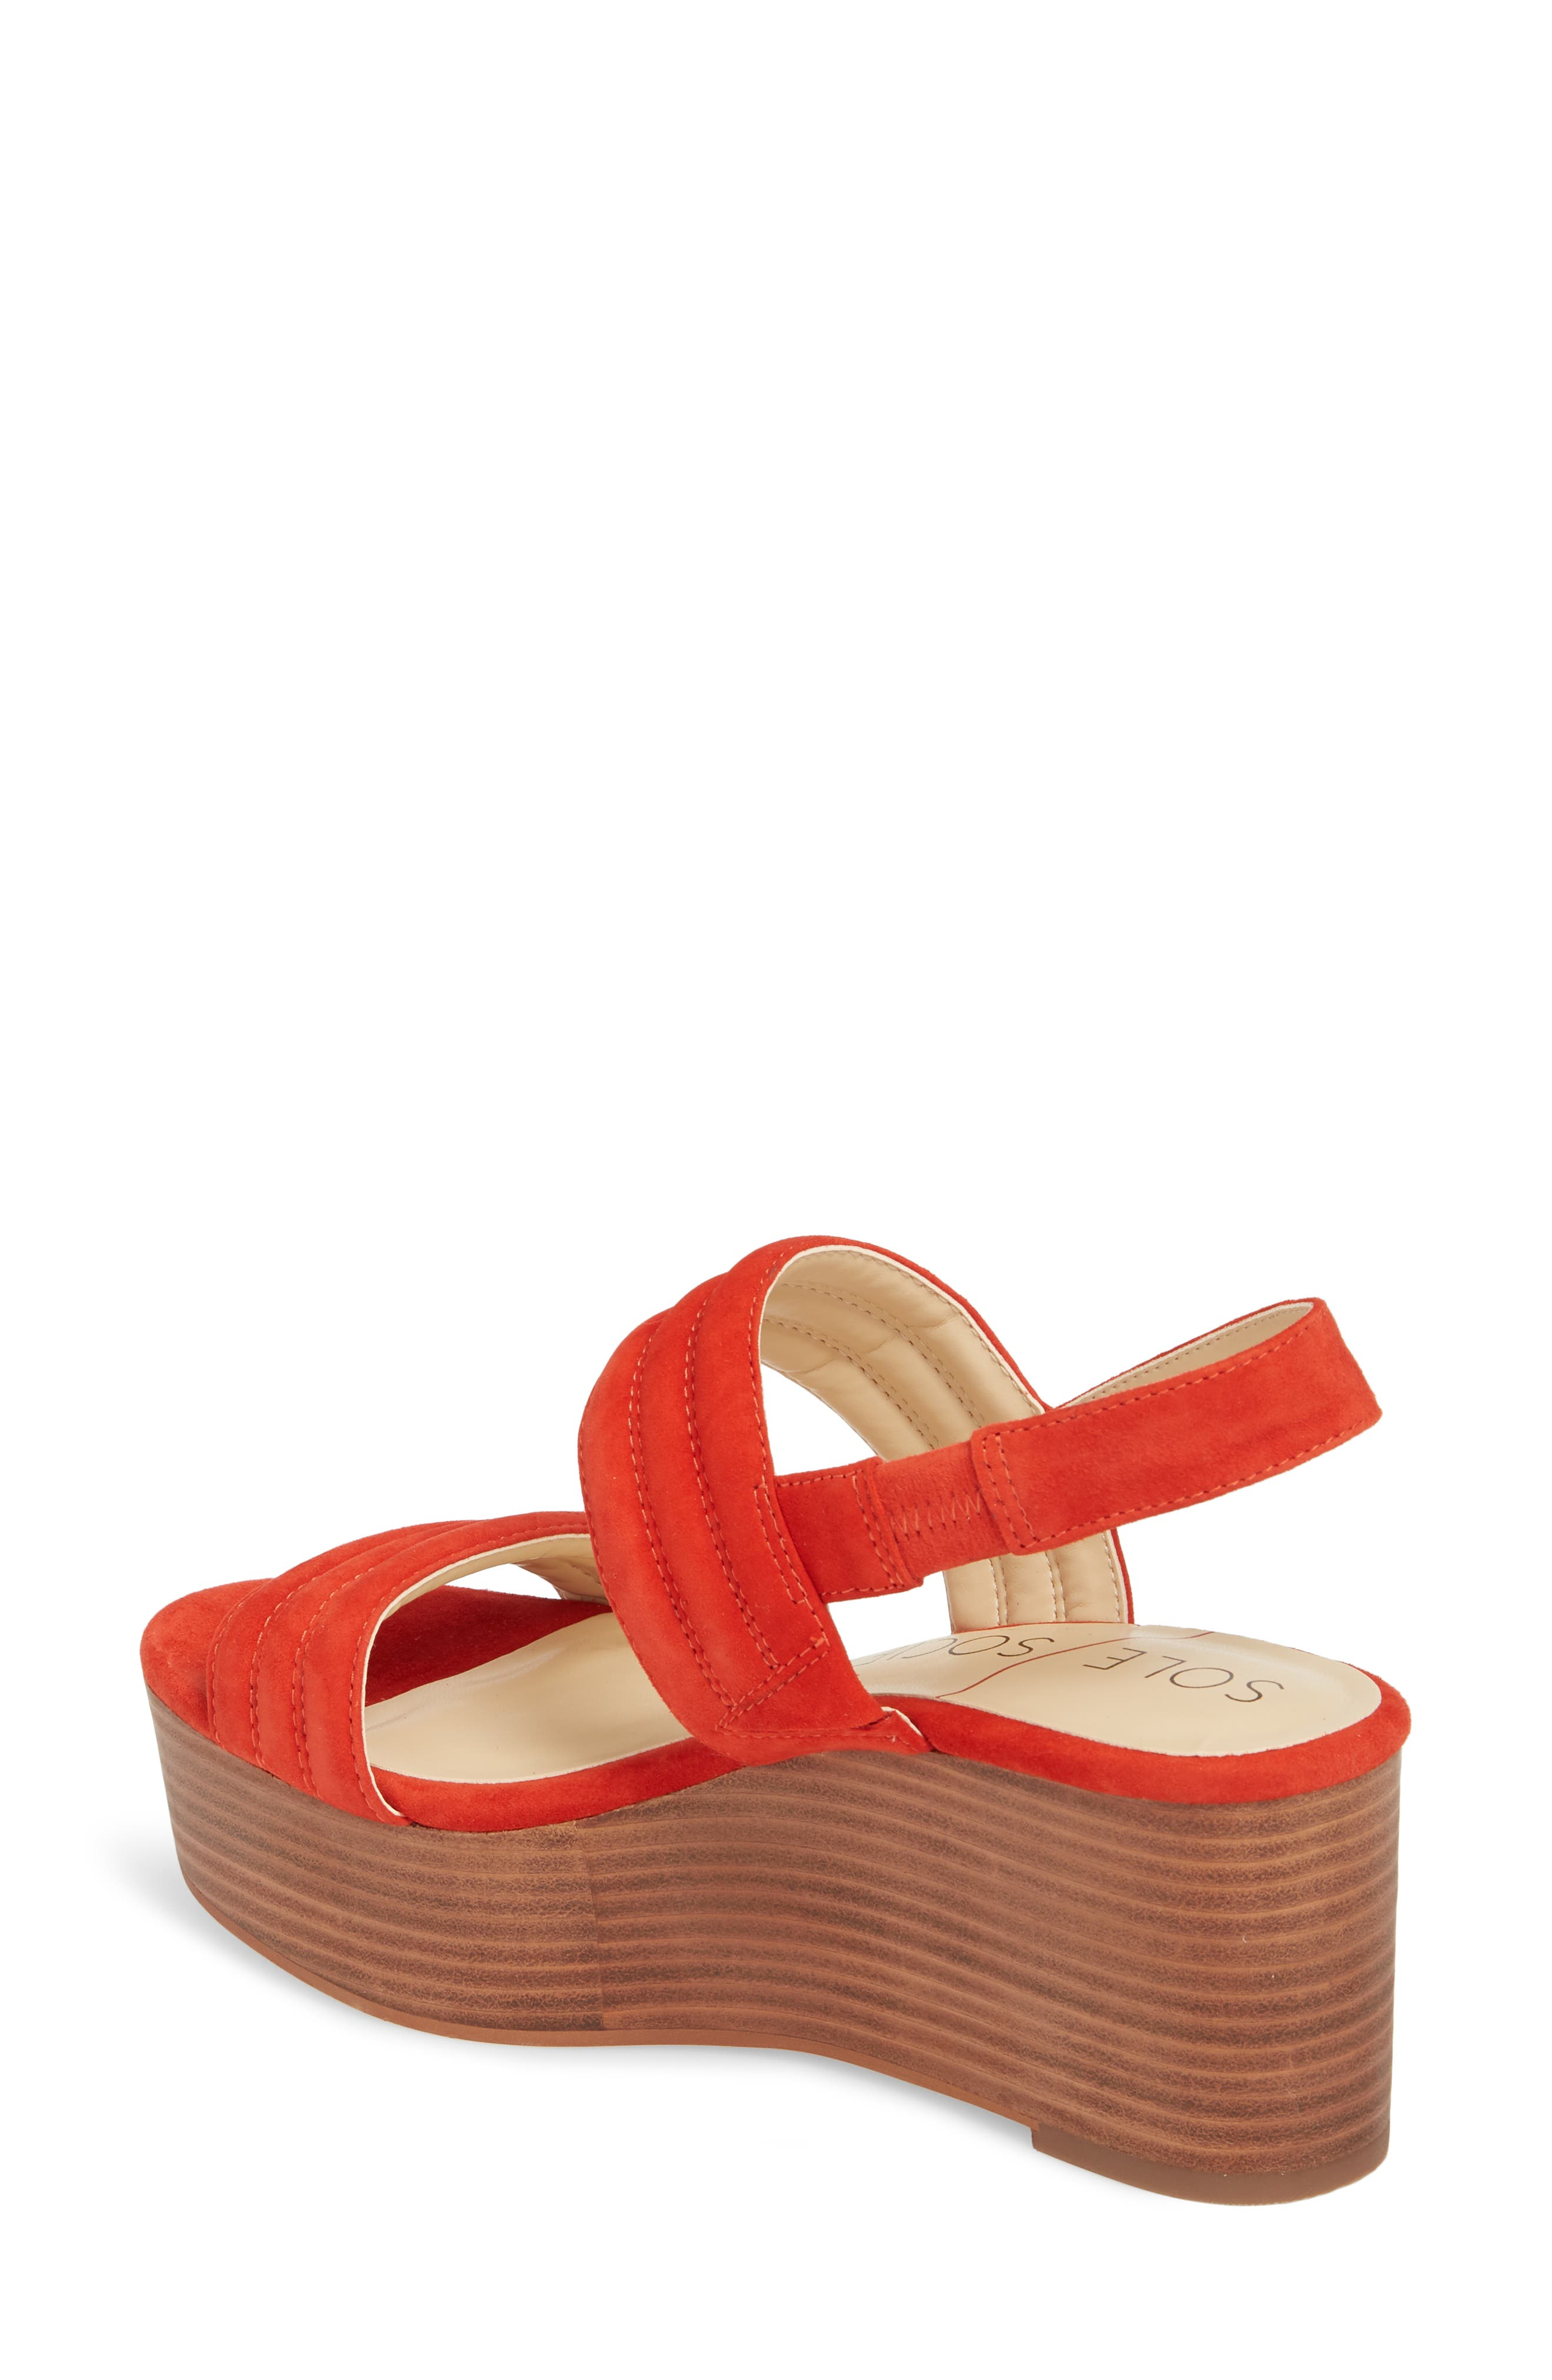 Amberly Platform Sandal,                             Alternate thumbnail 8, color,